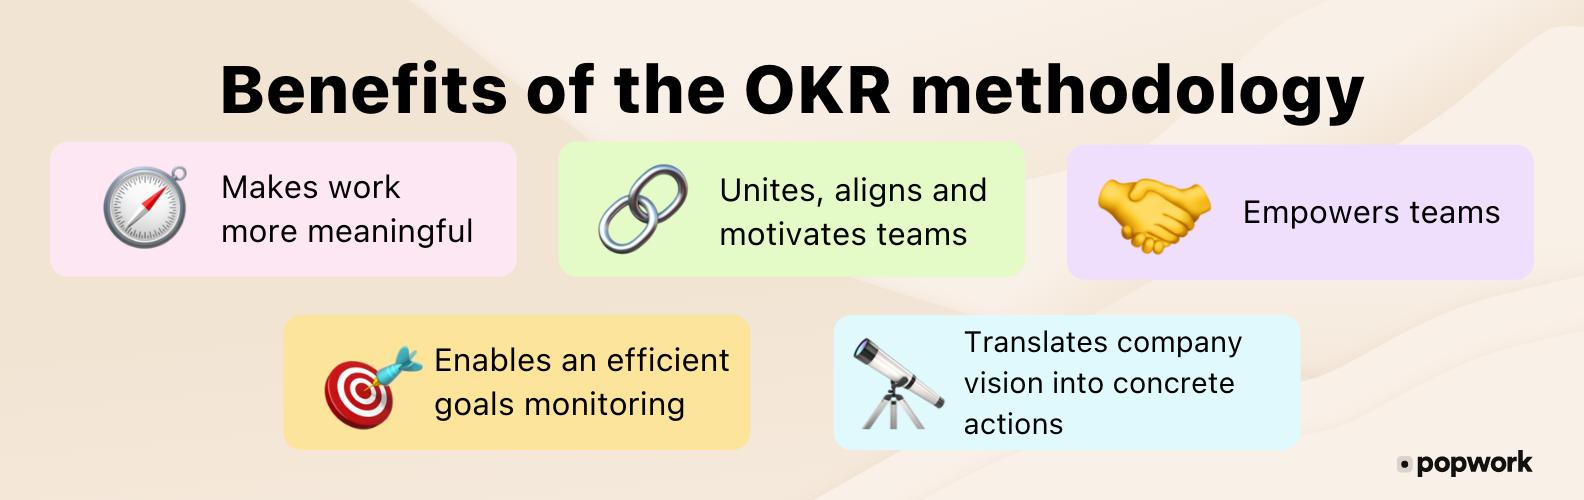 Banefits of the OKR methodology - Popwork